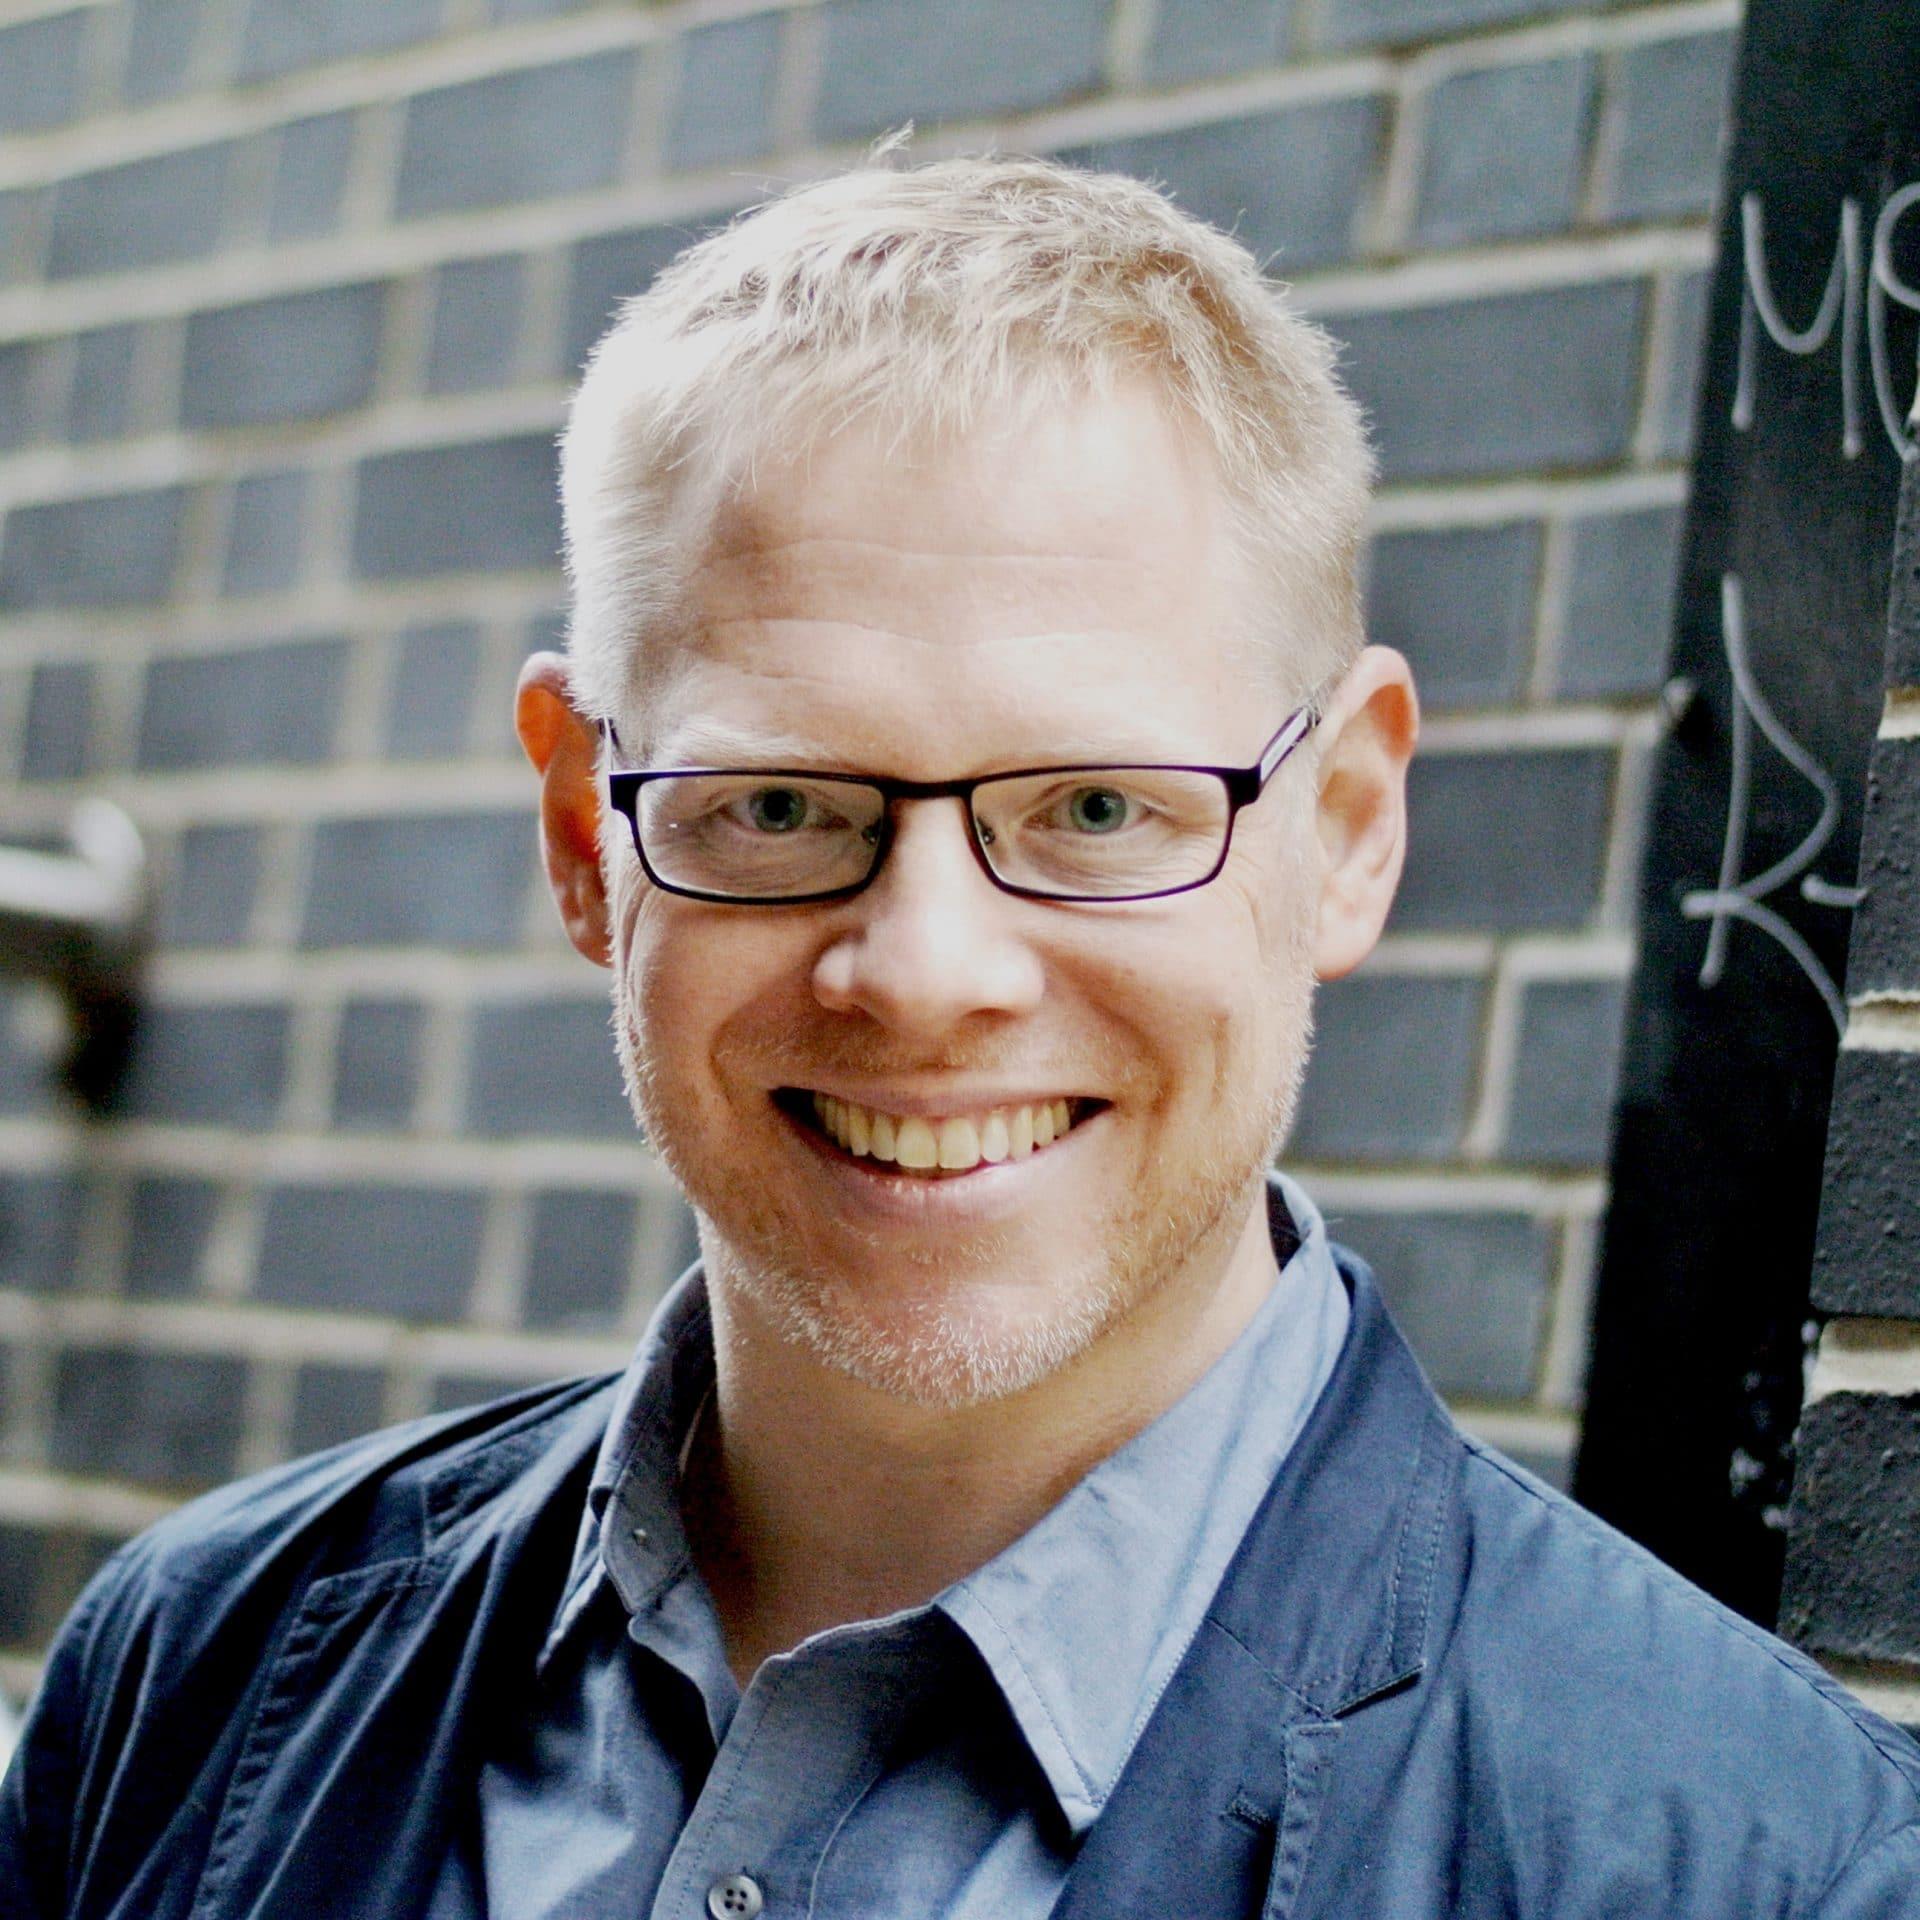 jon-burkhart-keynote-speaker